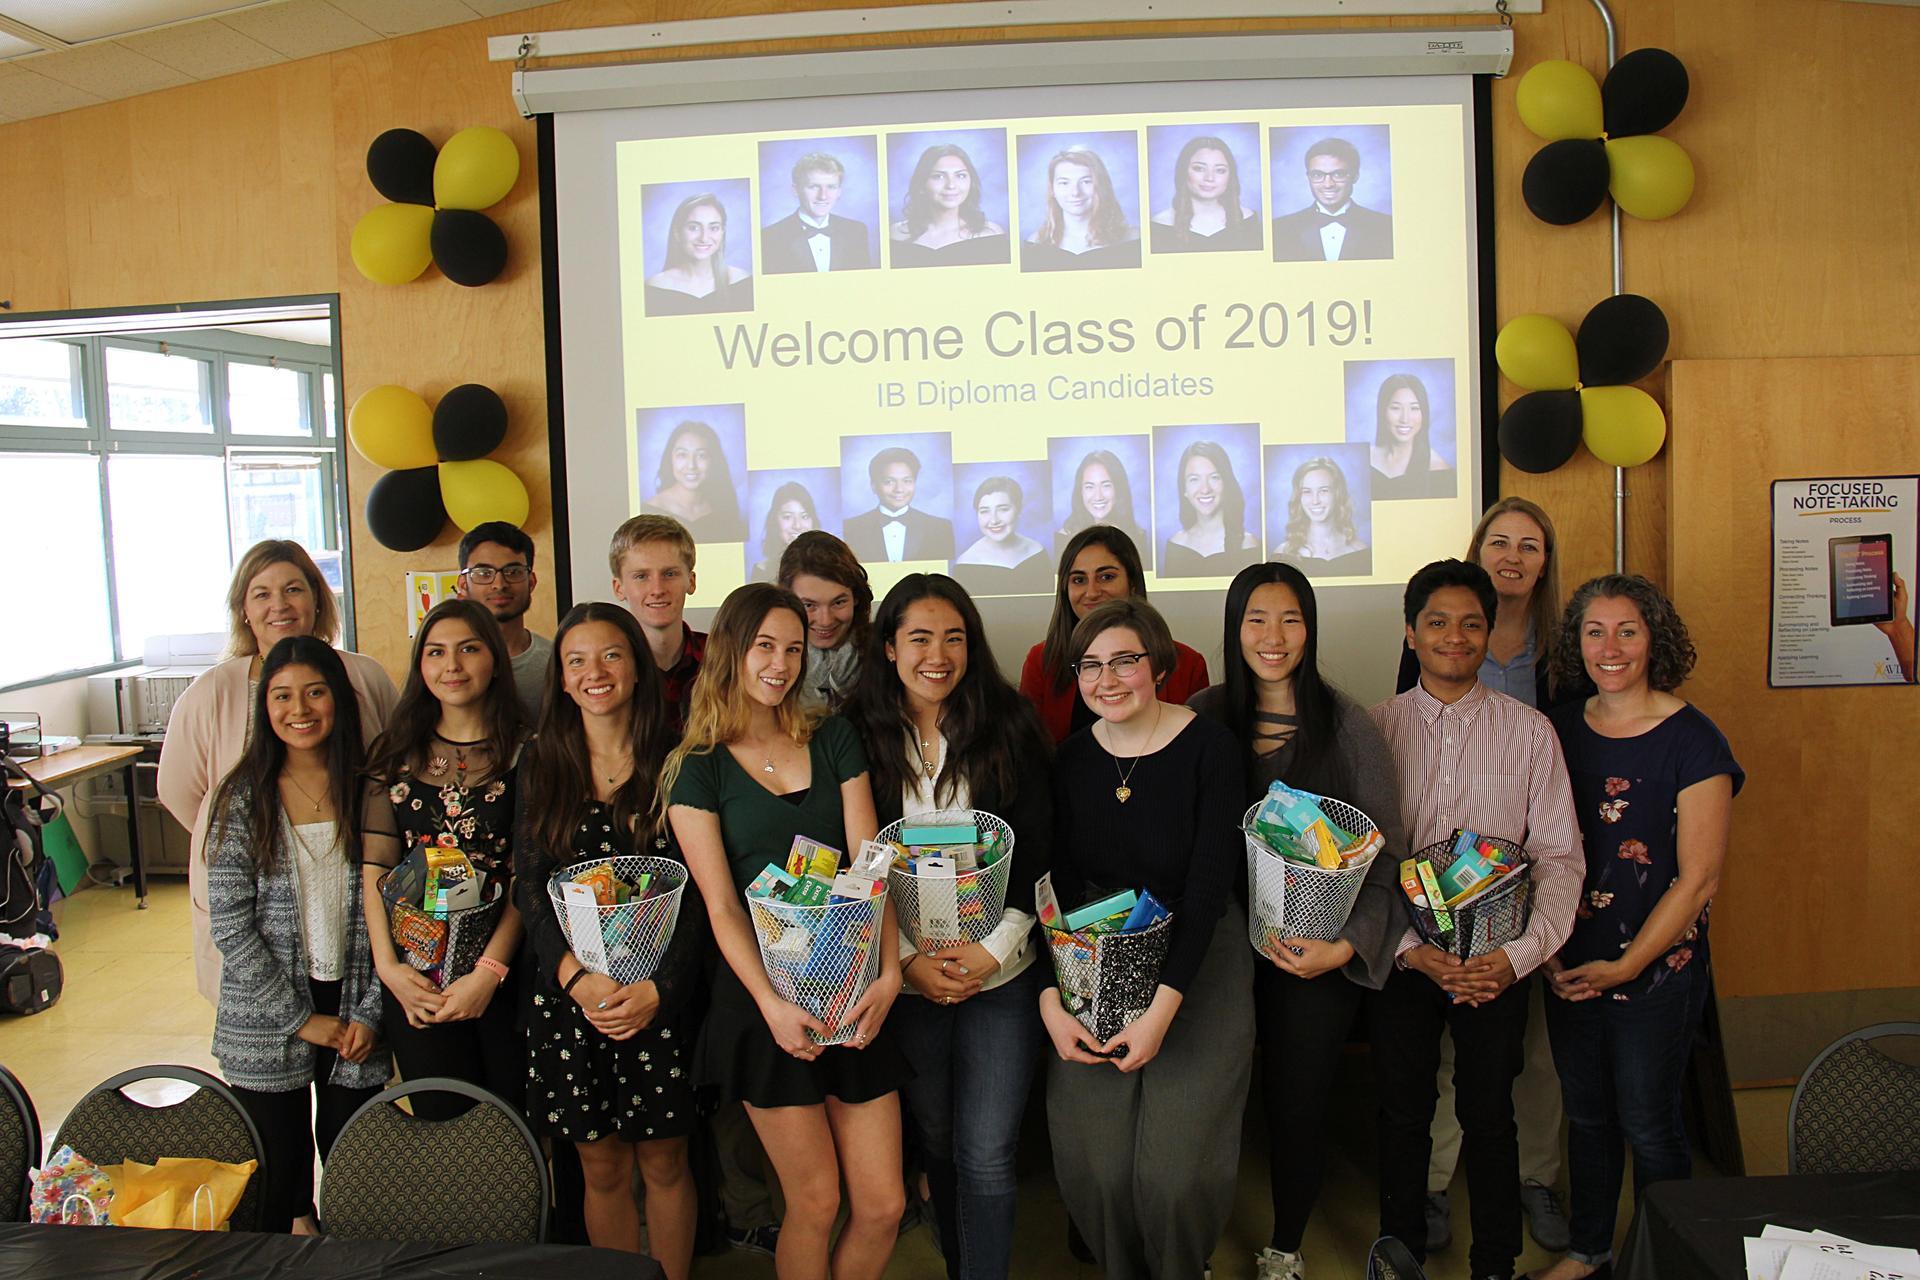 Image of 2019 IB Diploma Candidates at Creativity, Activity & Service Celebration